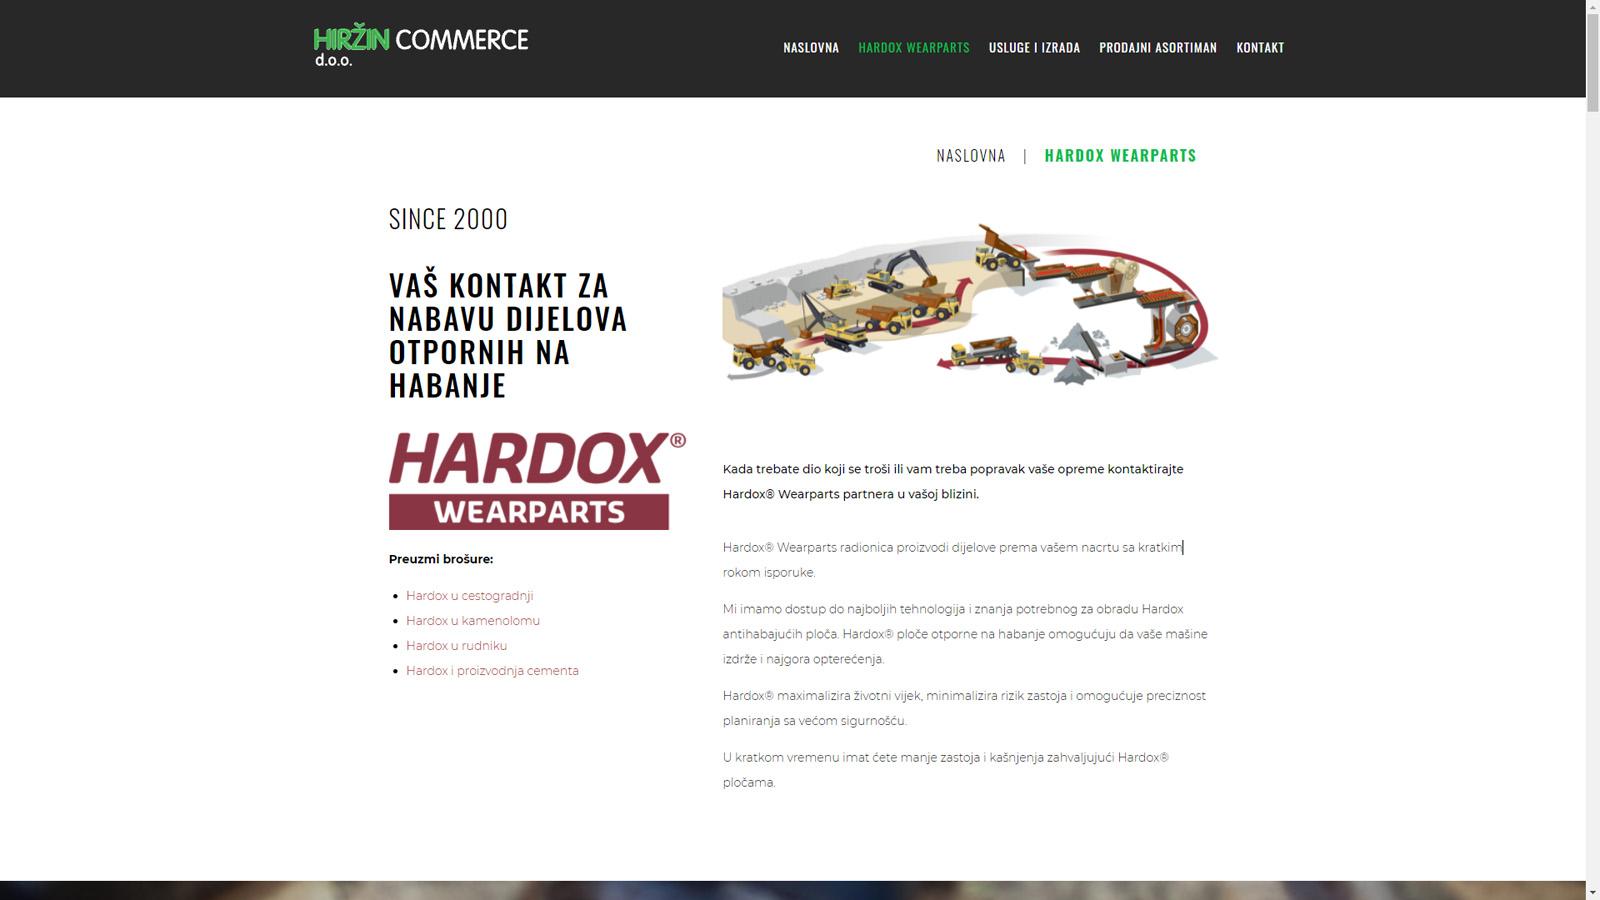 hirzin-commerce